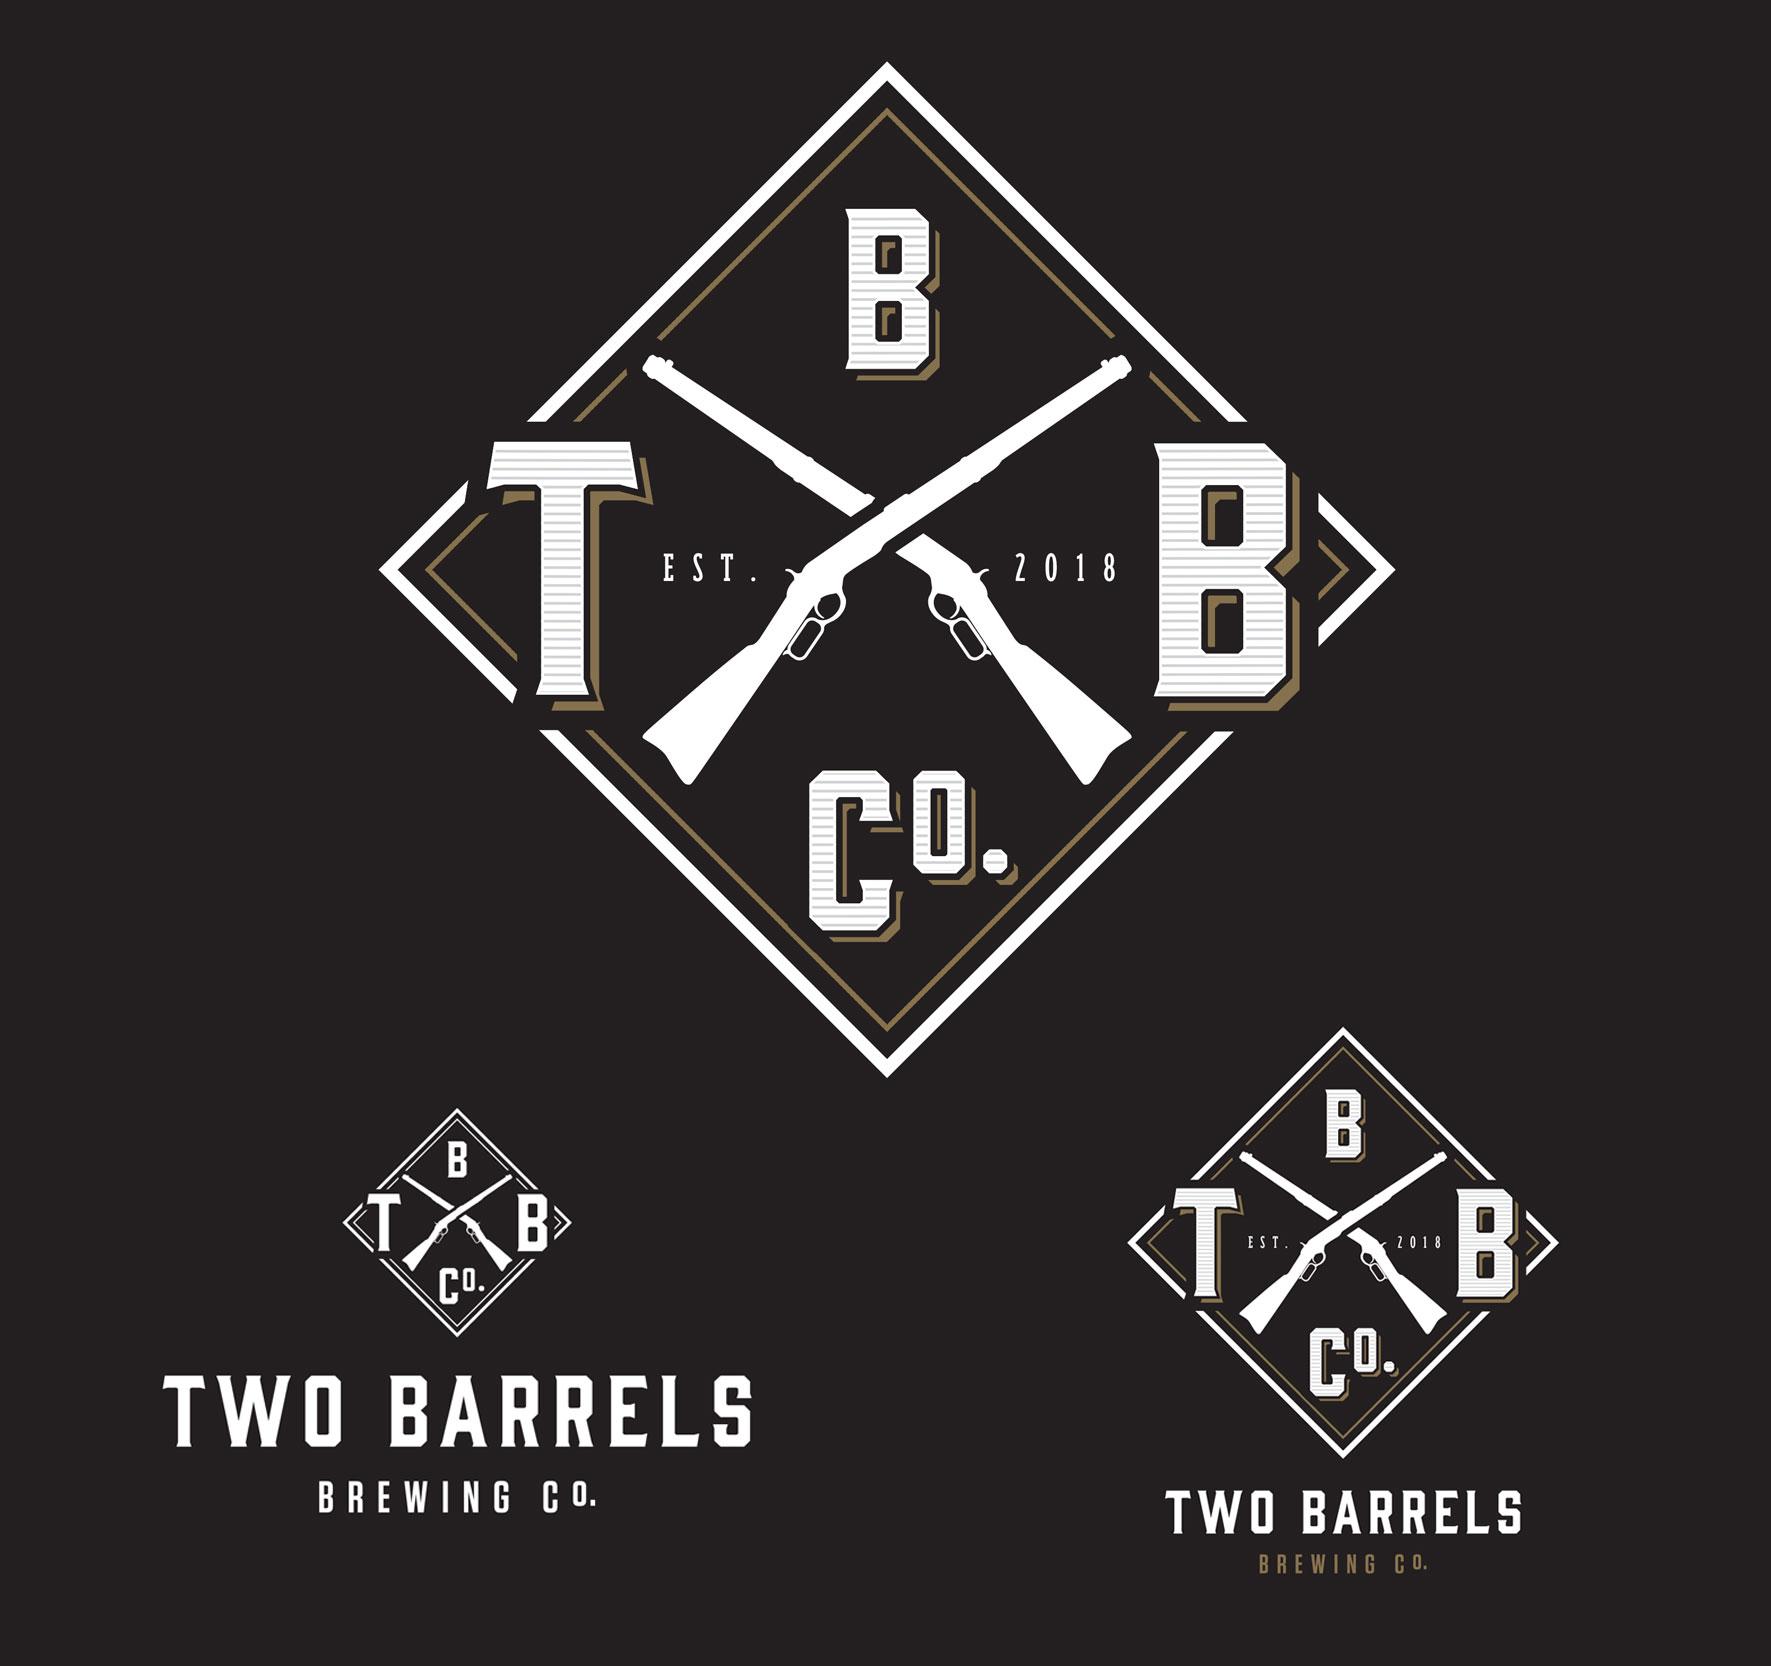 Two Barrels logo and branding